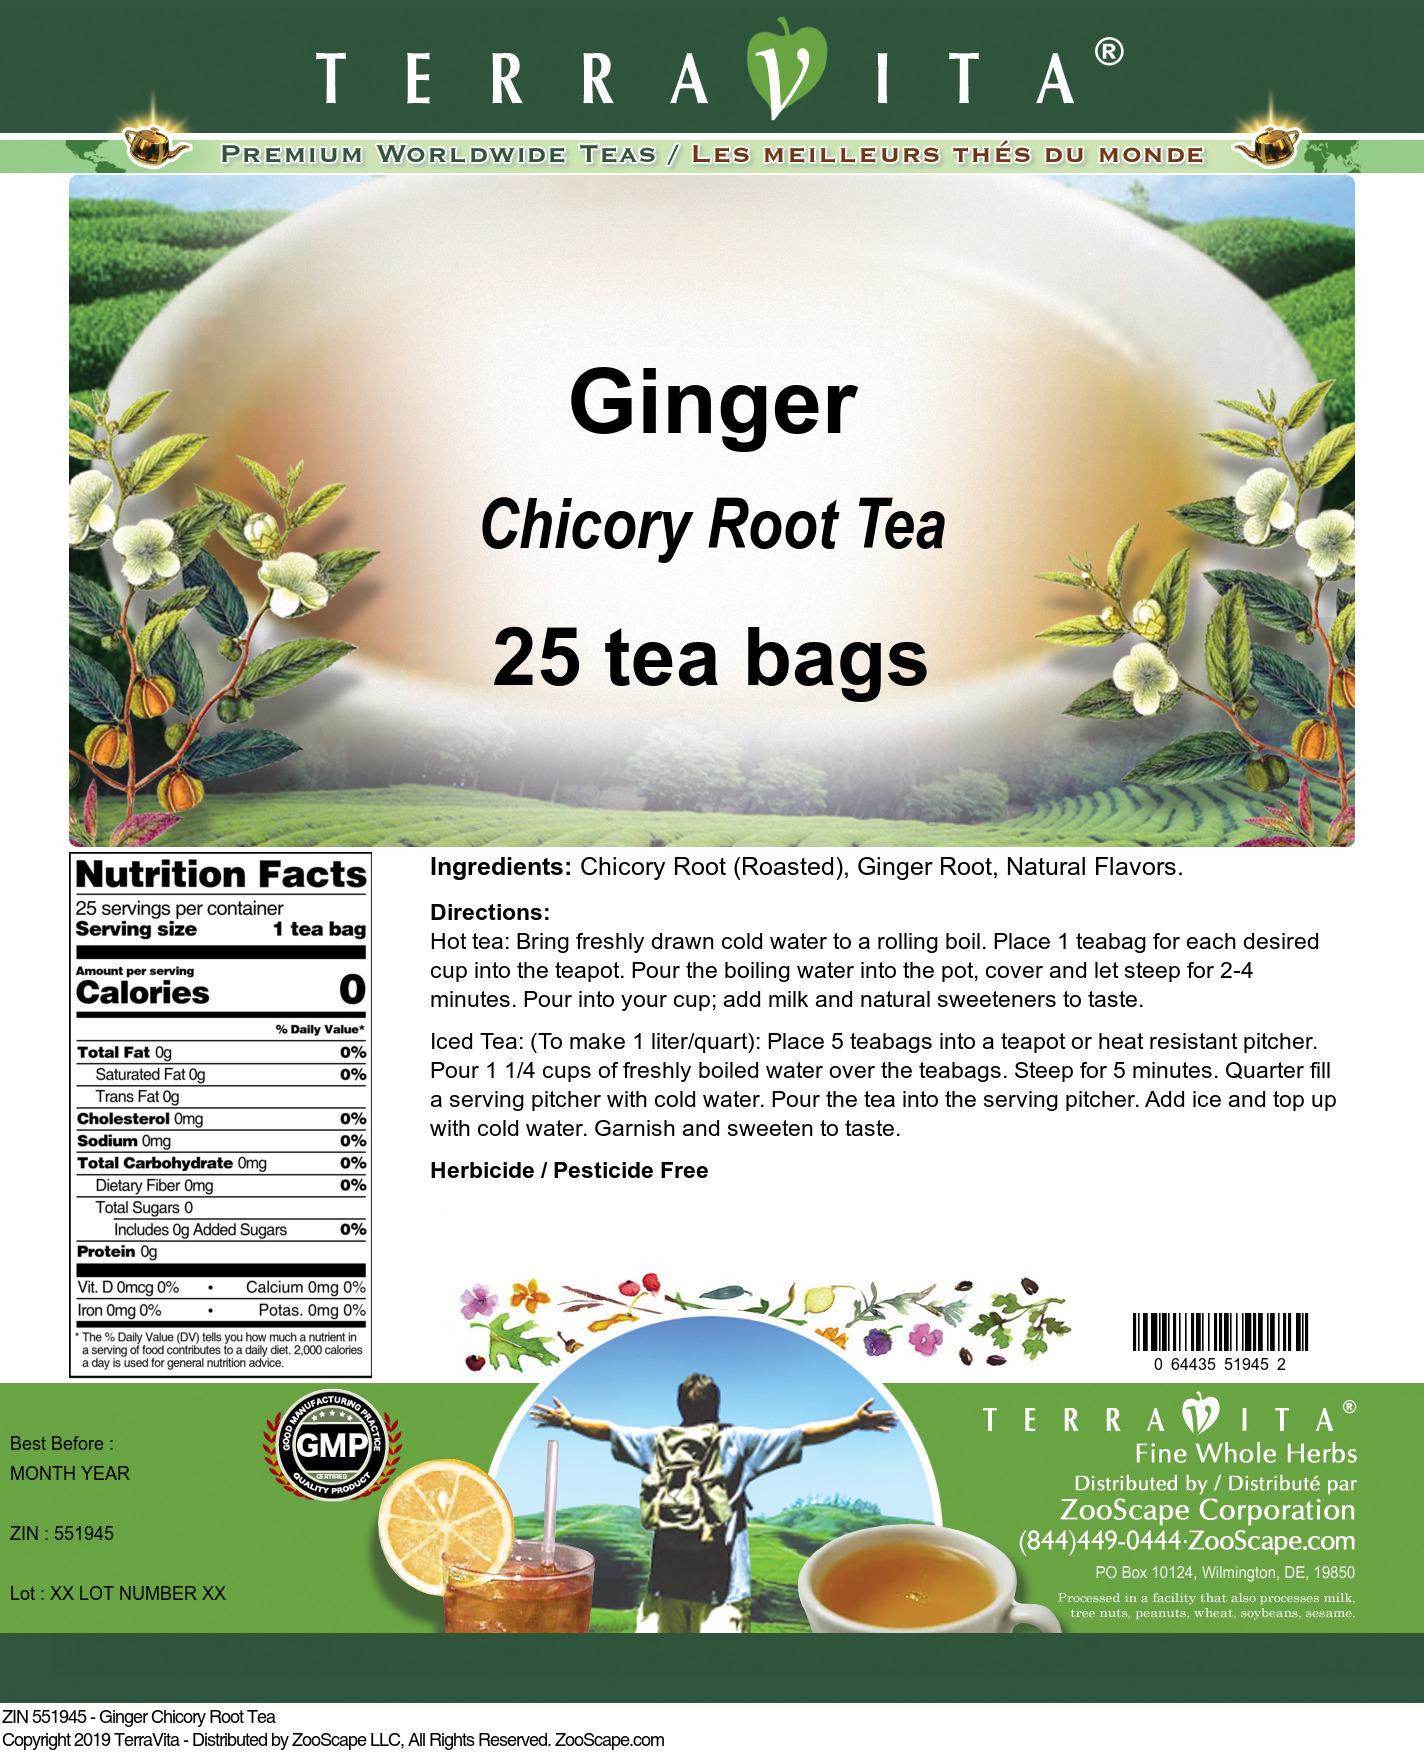 Ginger Chicory Root Tea